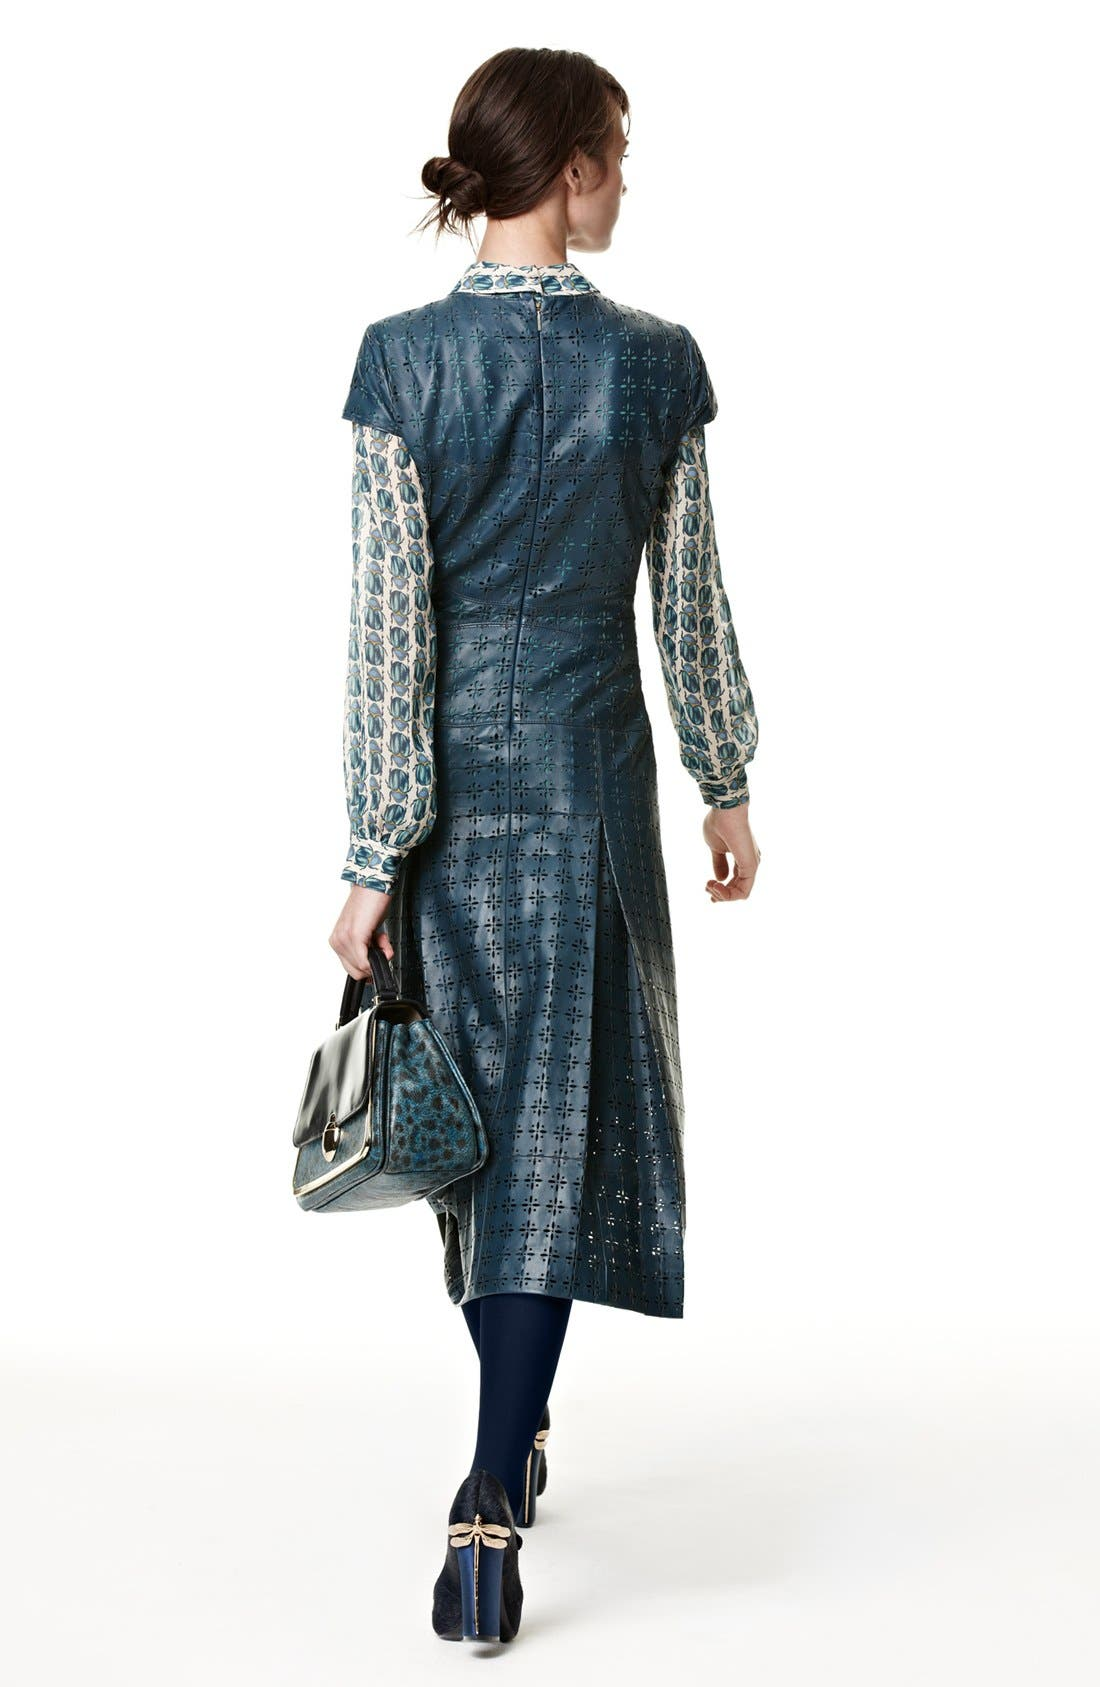 Main Image - Tory Burch Leather Midi Dress, Blouse, & Pump